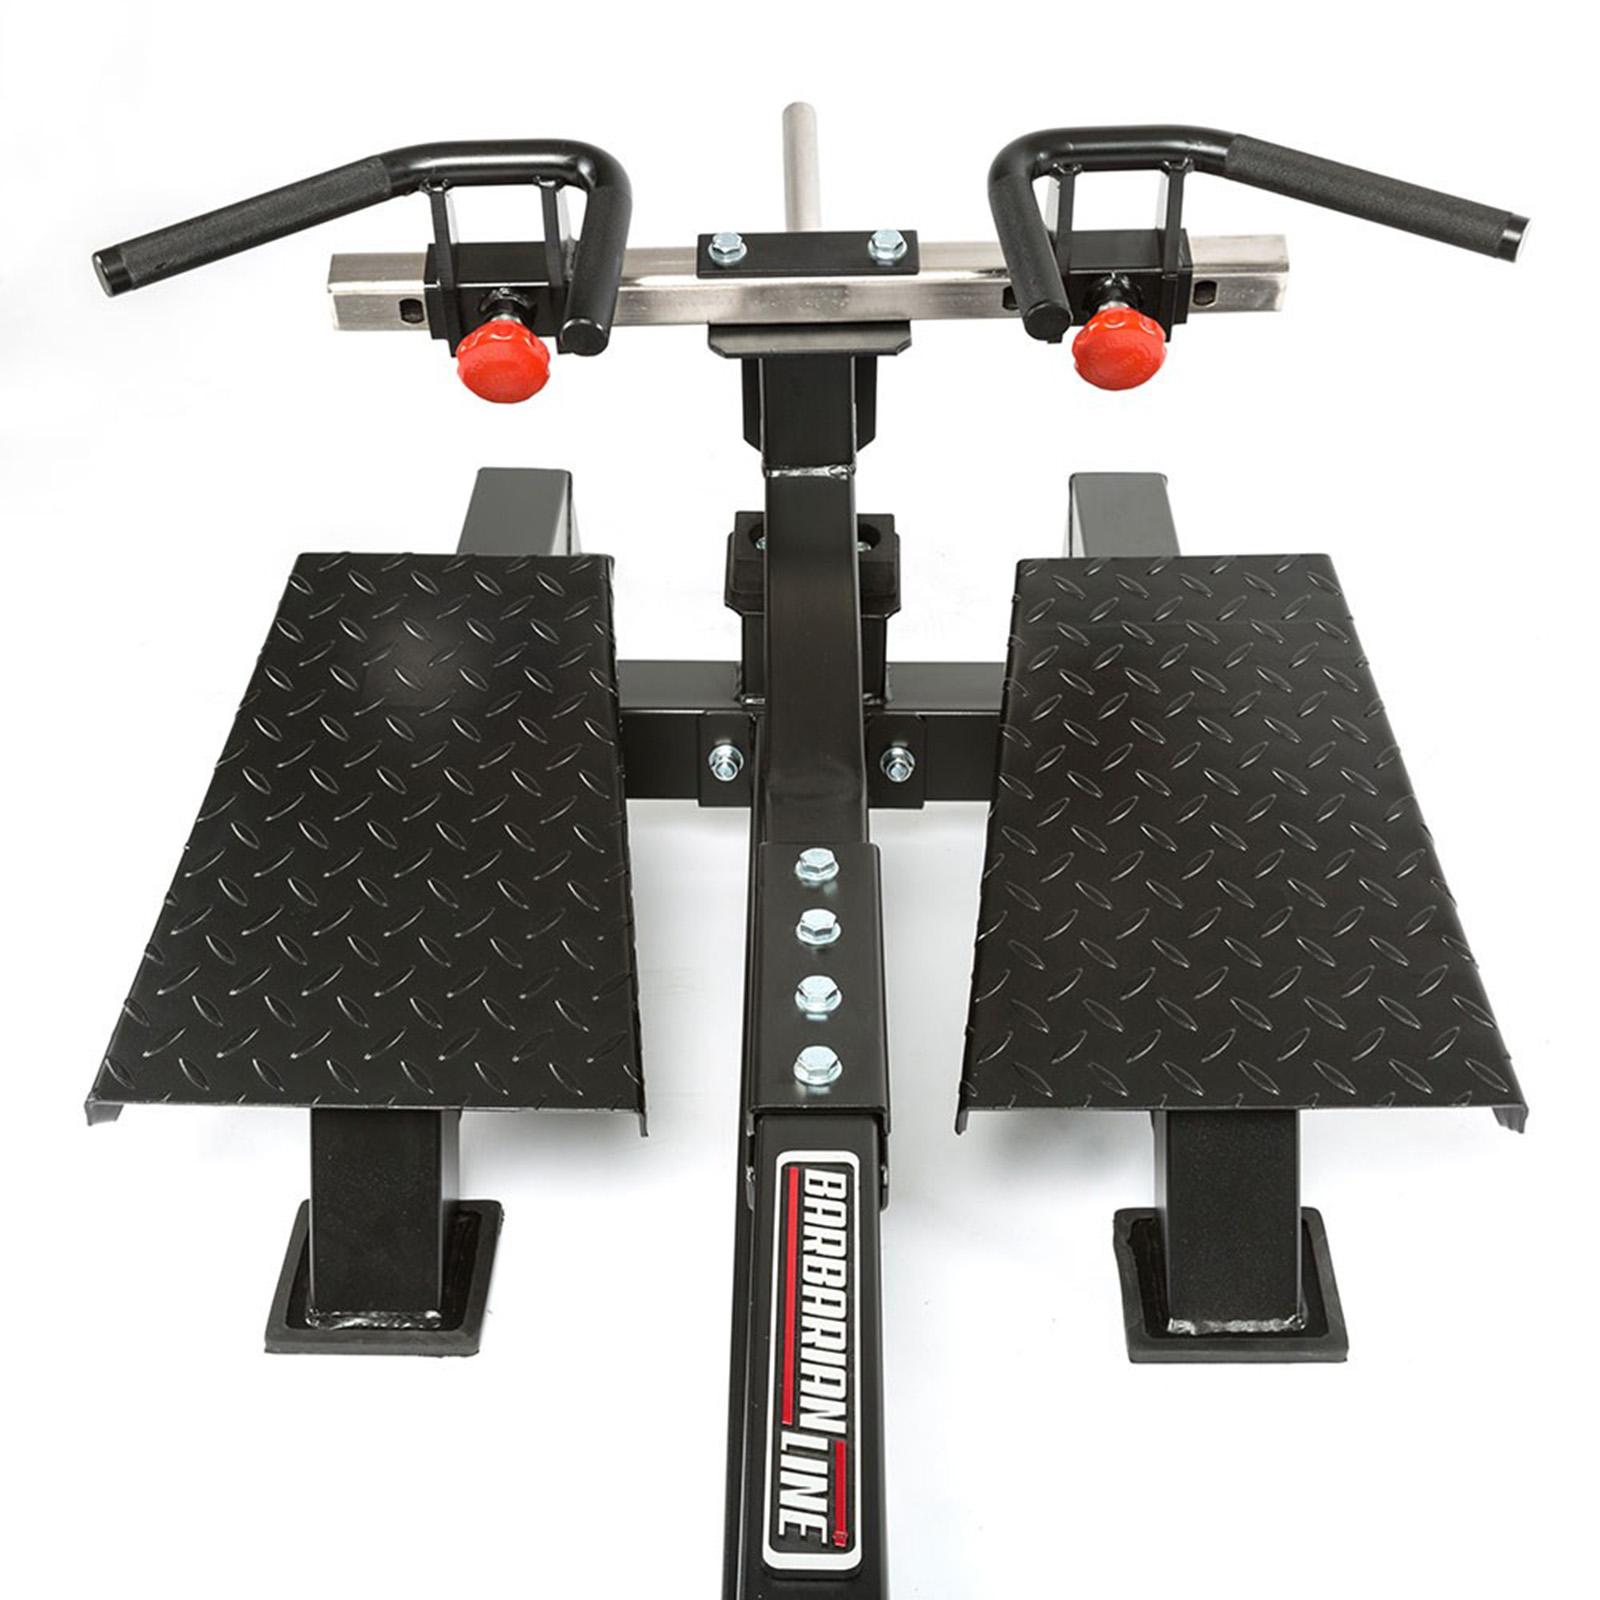 t-bar row platform